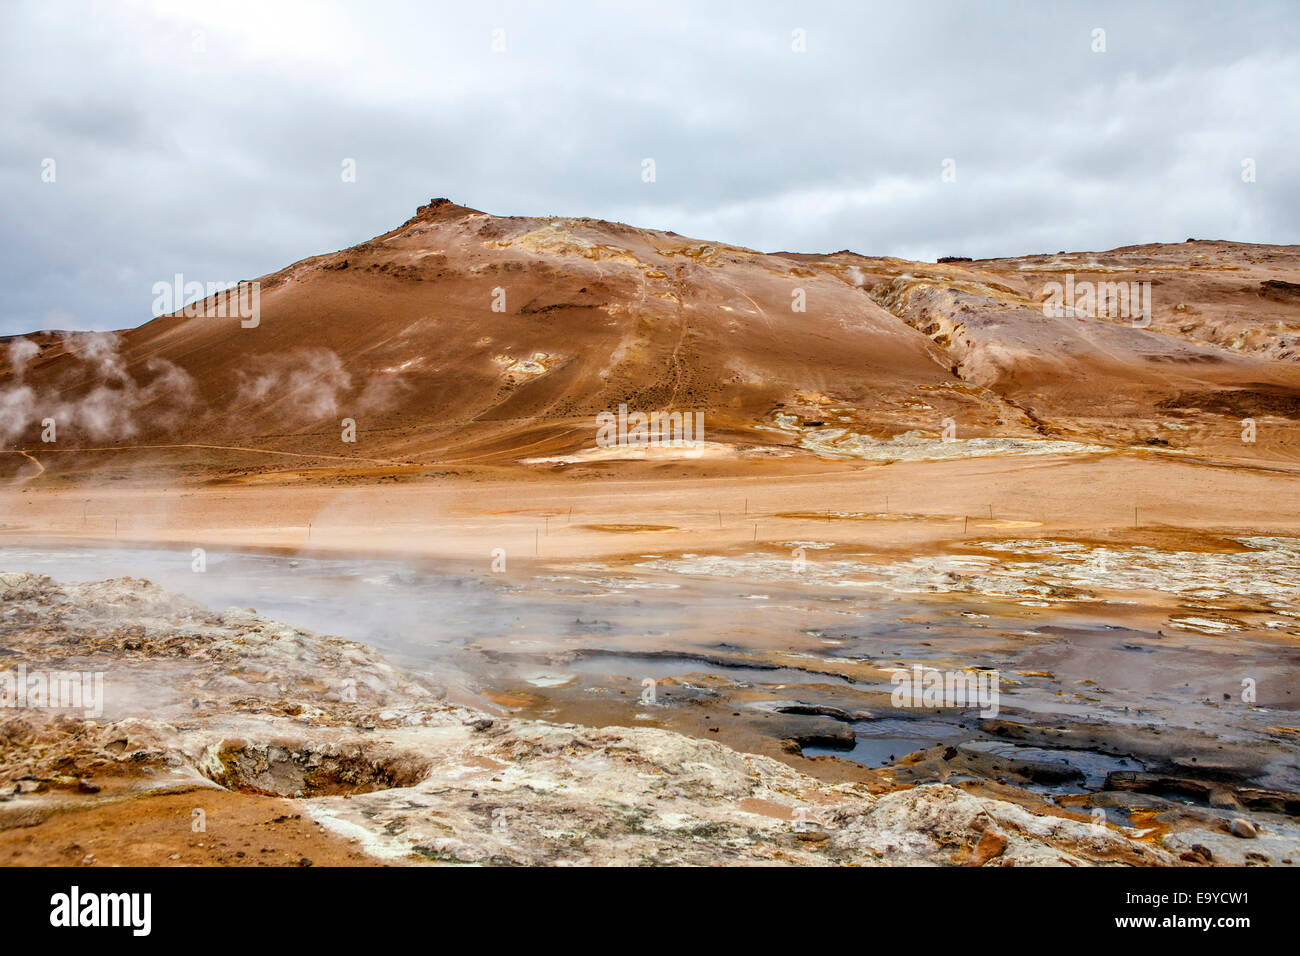 Geothermal region of Hverir in Iceland near Myvatn Lake, with fumaroles venting pressurised gases, sulphur springs - Stock Image